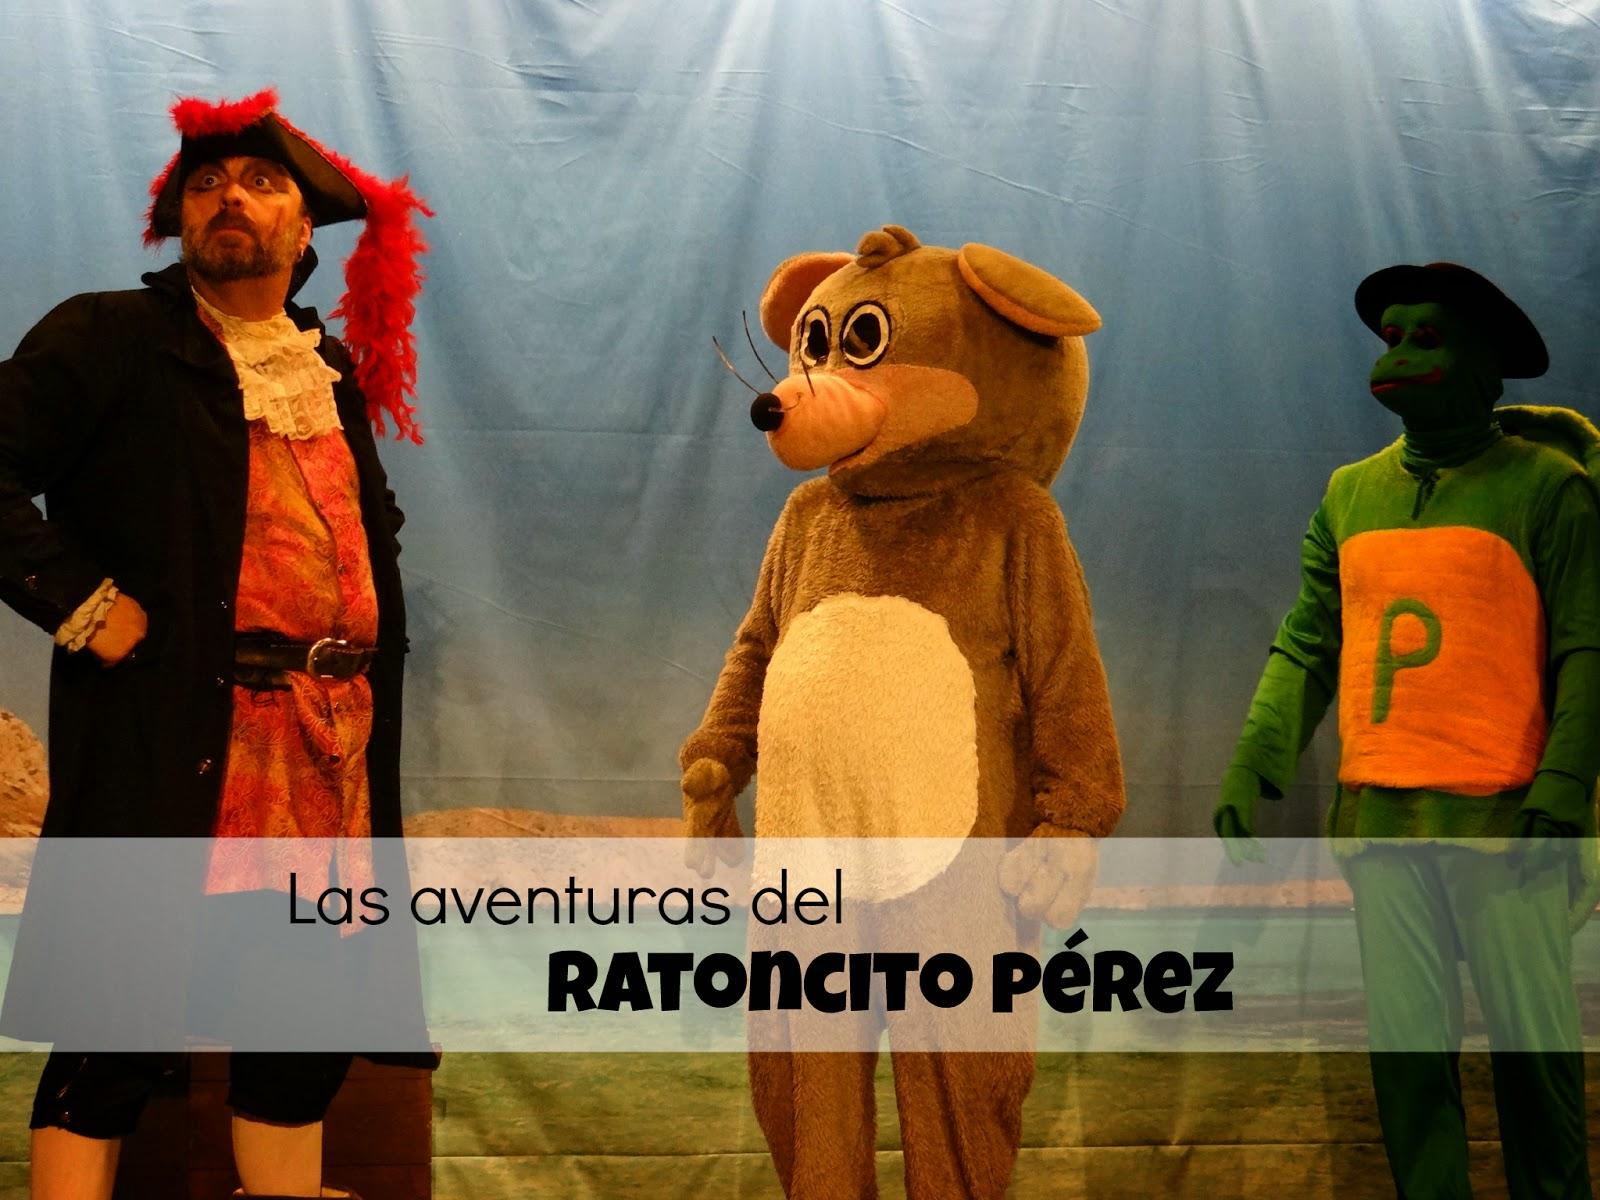 Las aventuras del Ratoncito Pérez